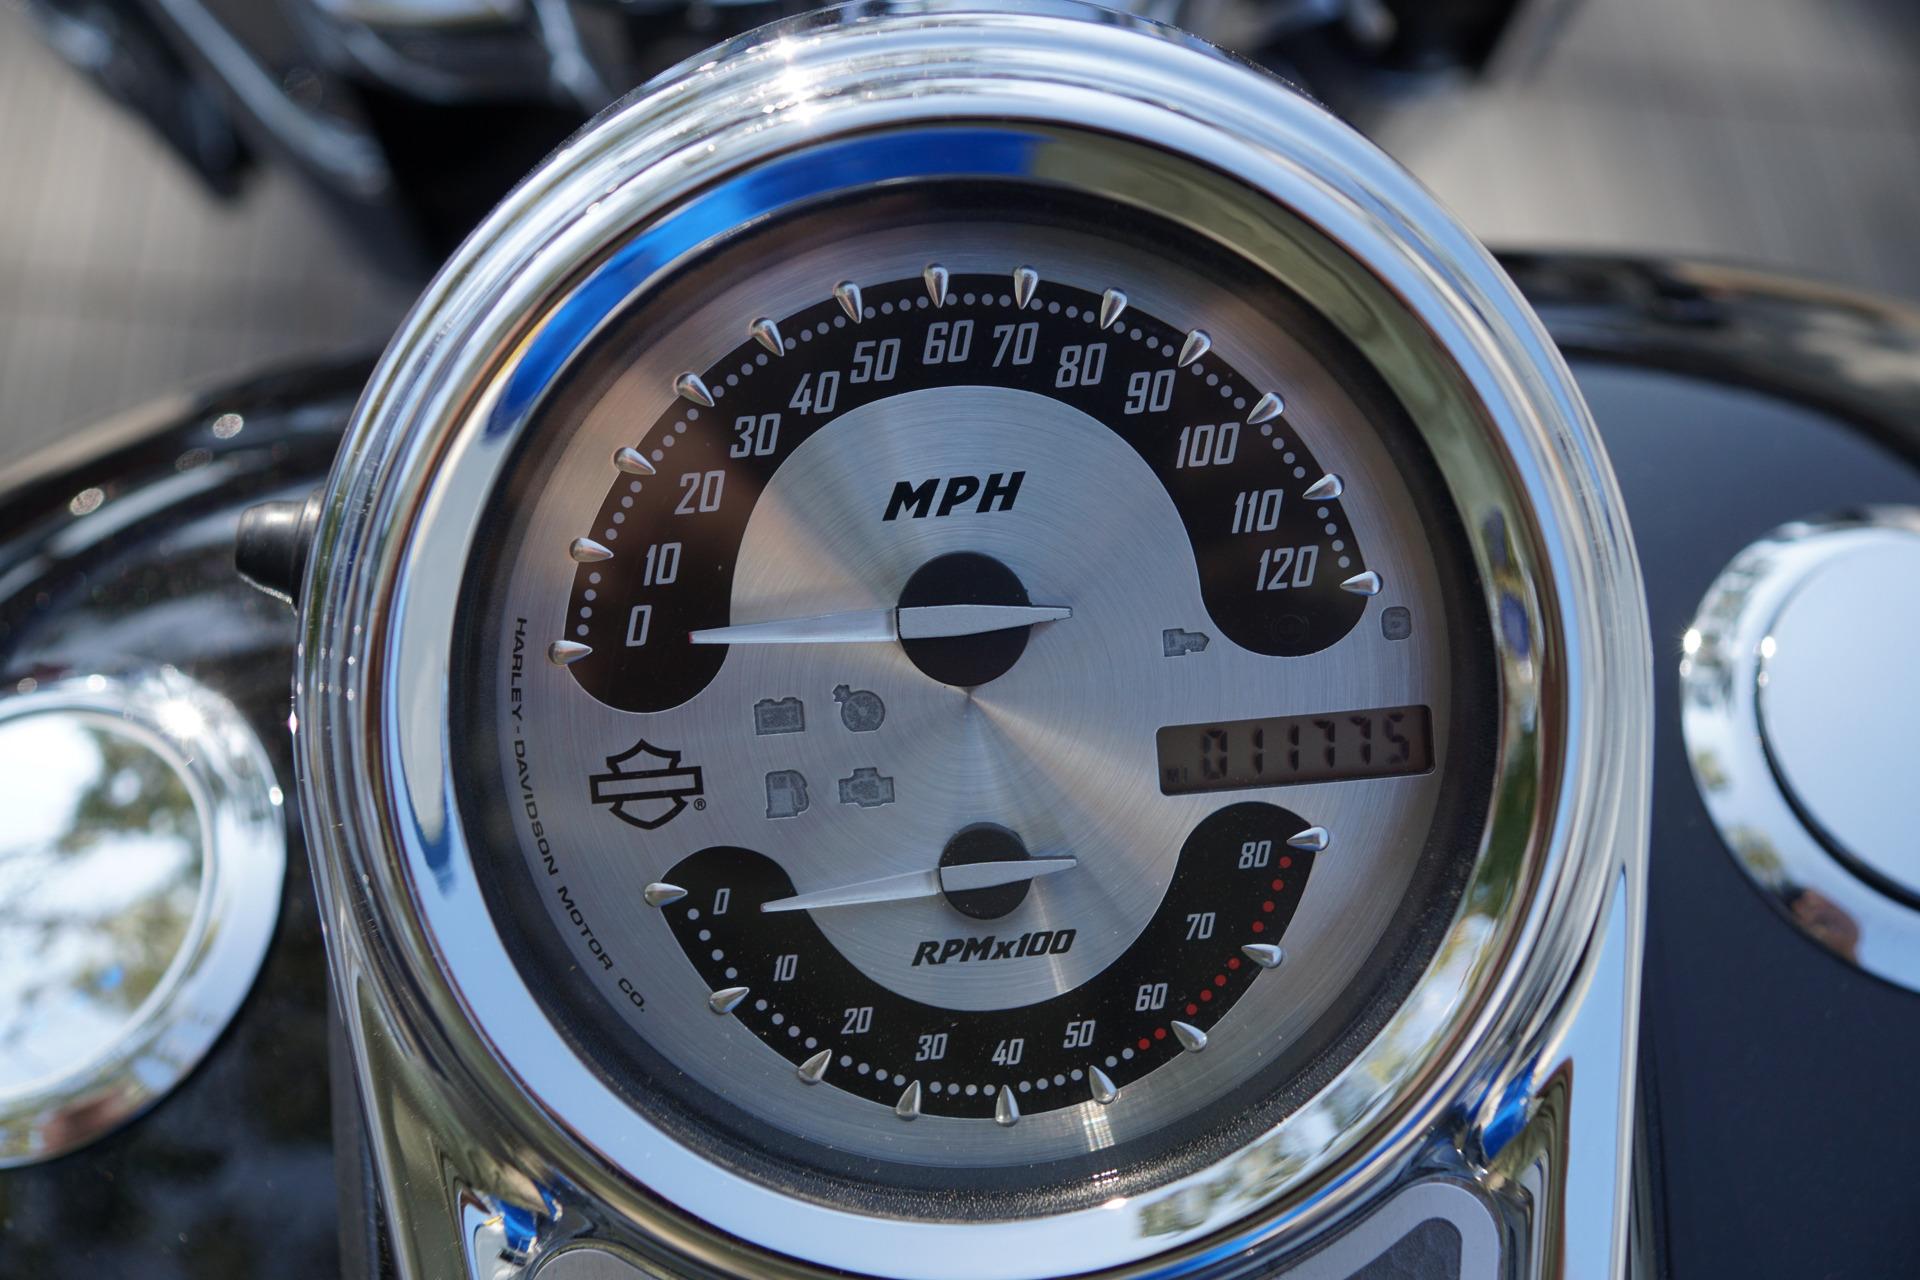 Harley Road King Tach Wiring | WIRING DIAGRAM eBOOK on